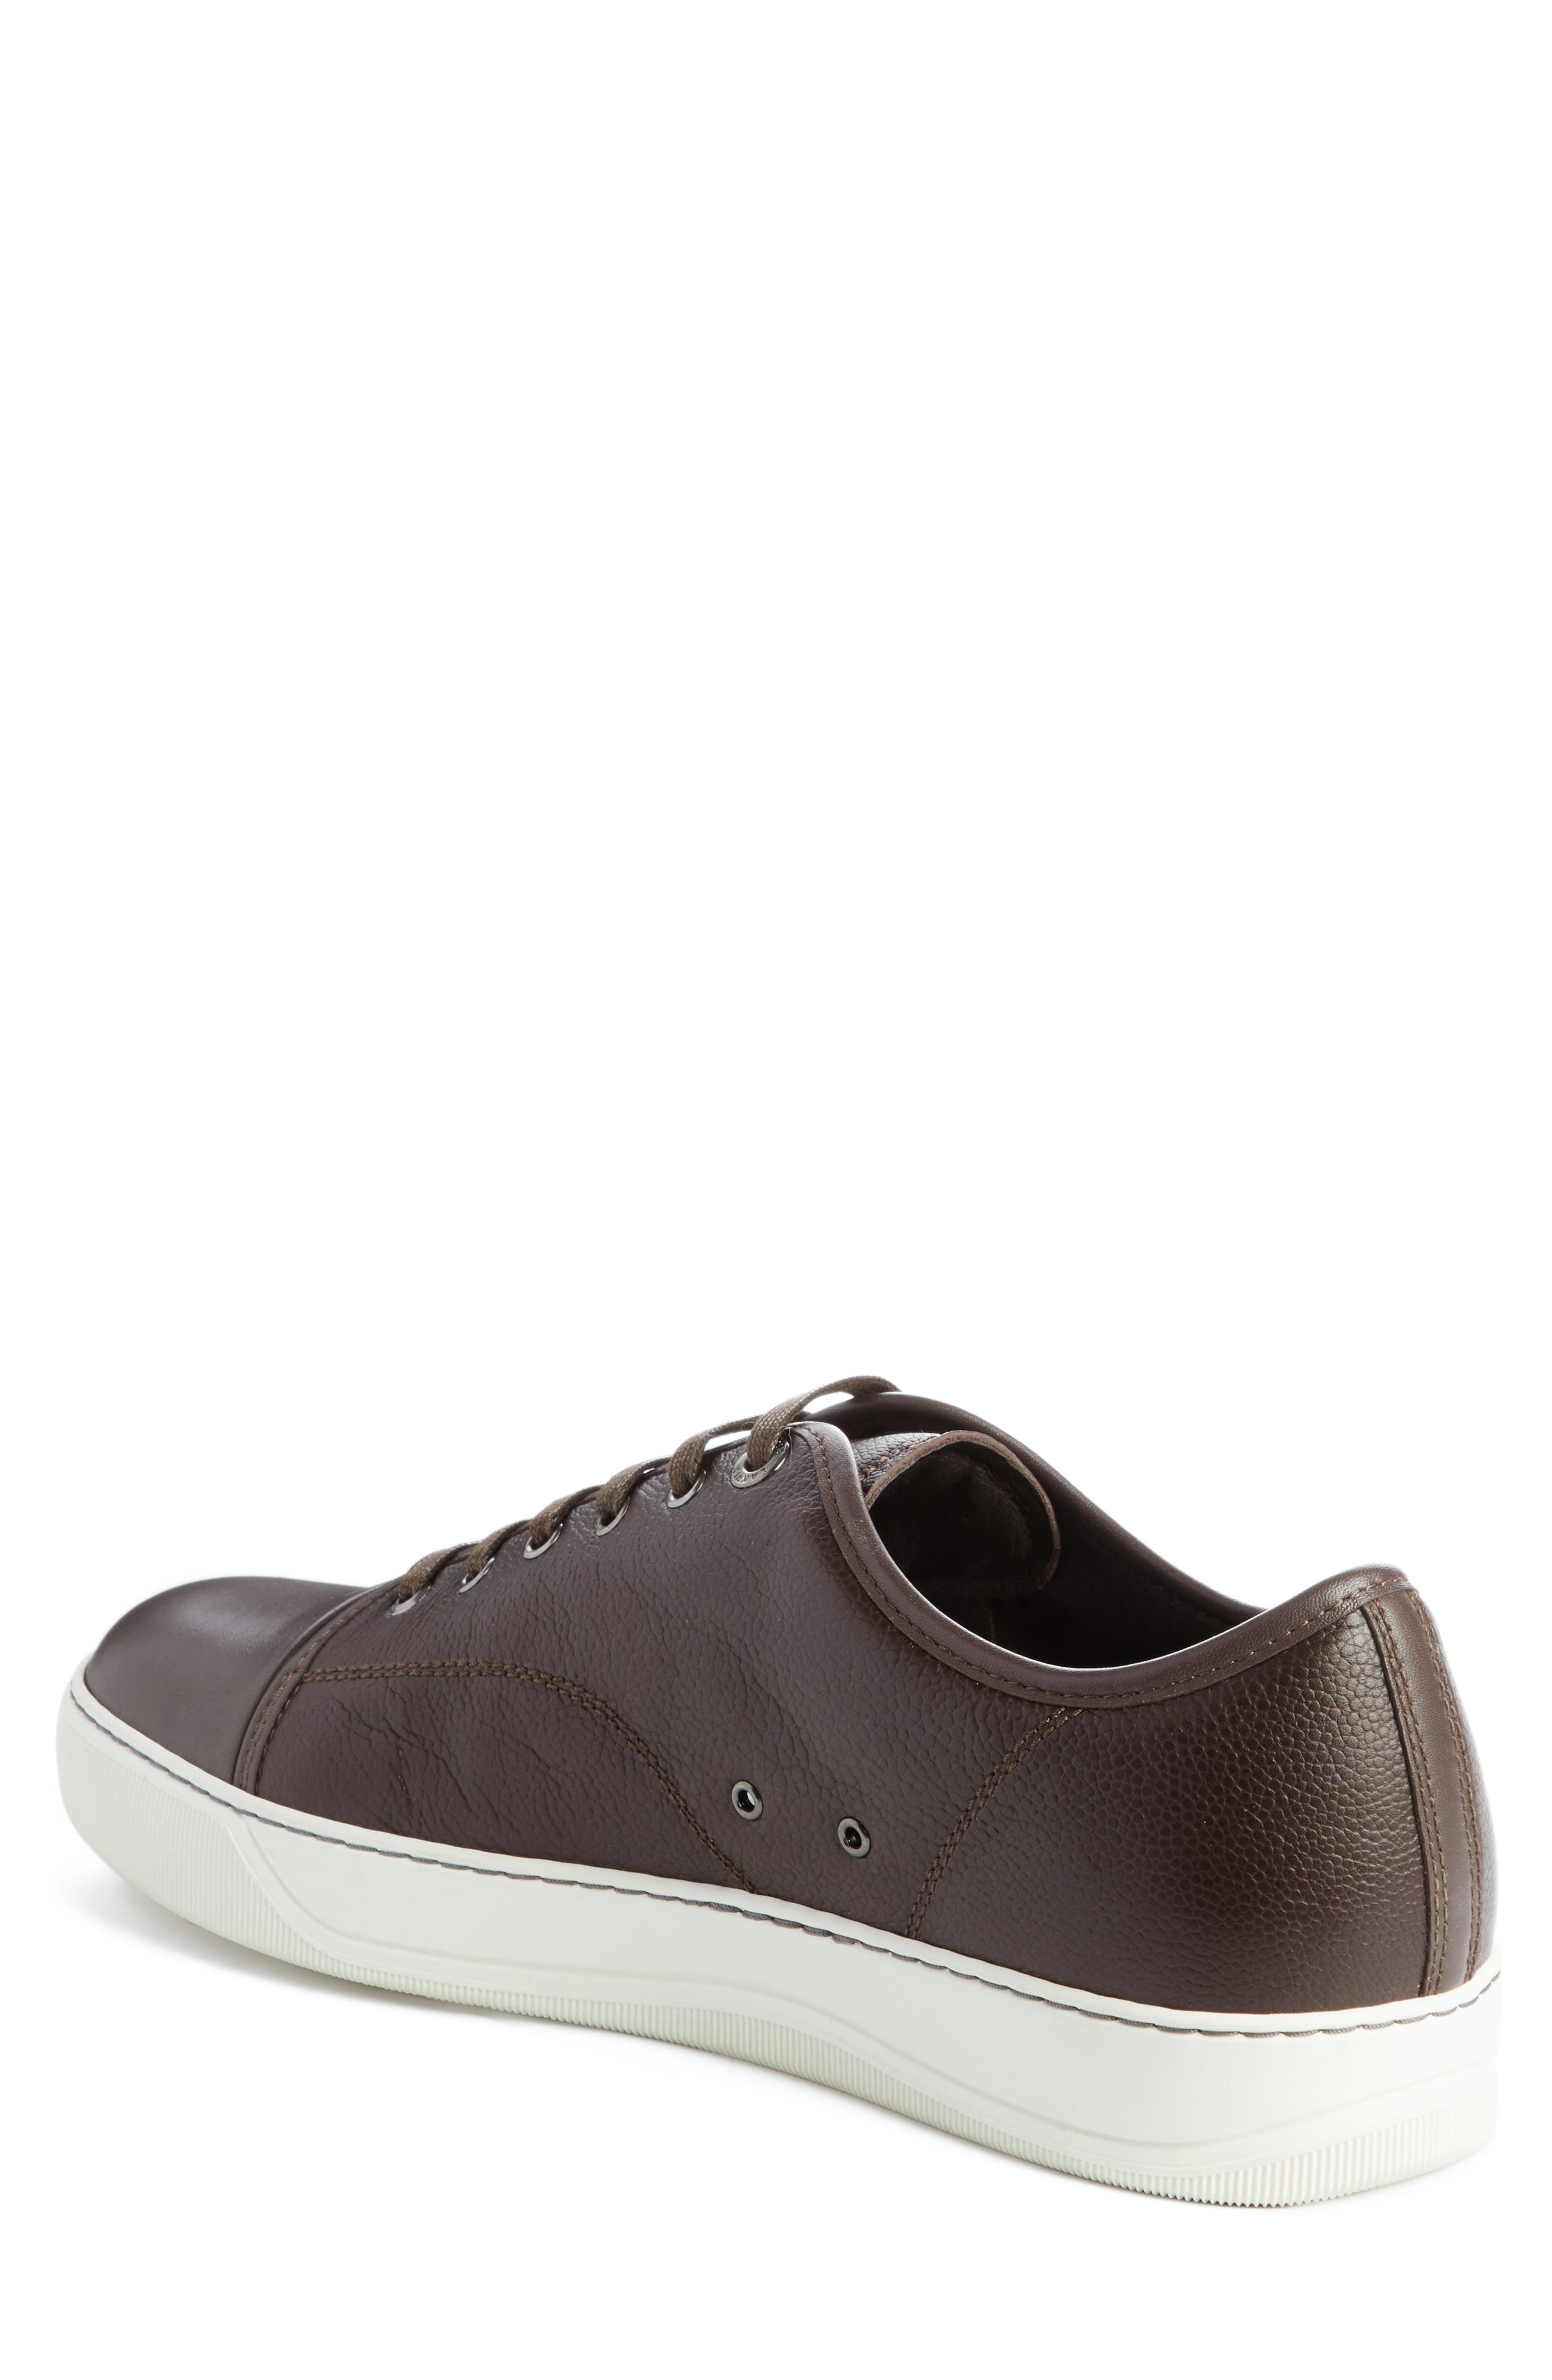 Alternate Image 2  - Lanvin Shiny Cap Toe Sneaker (Men)